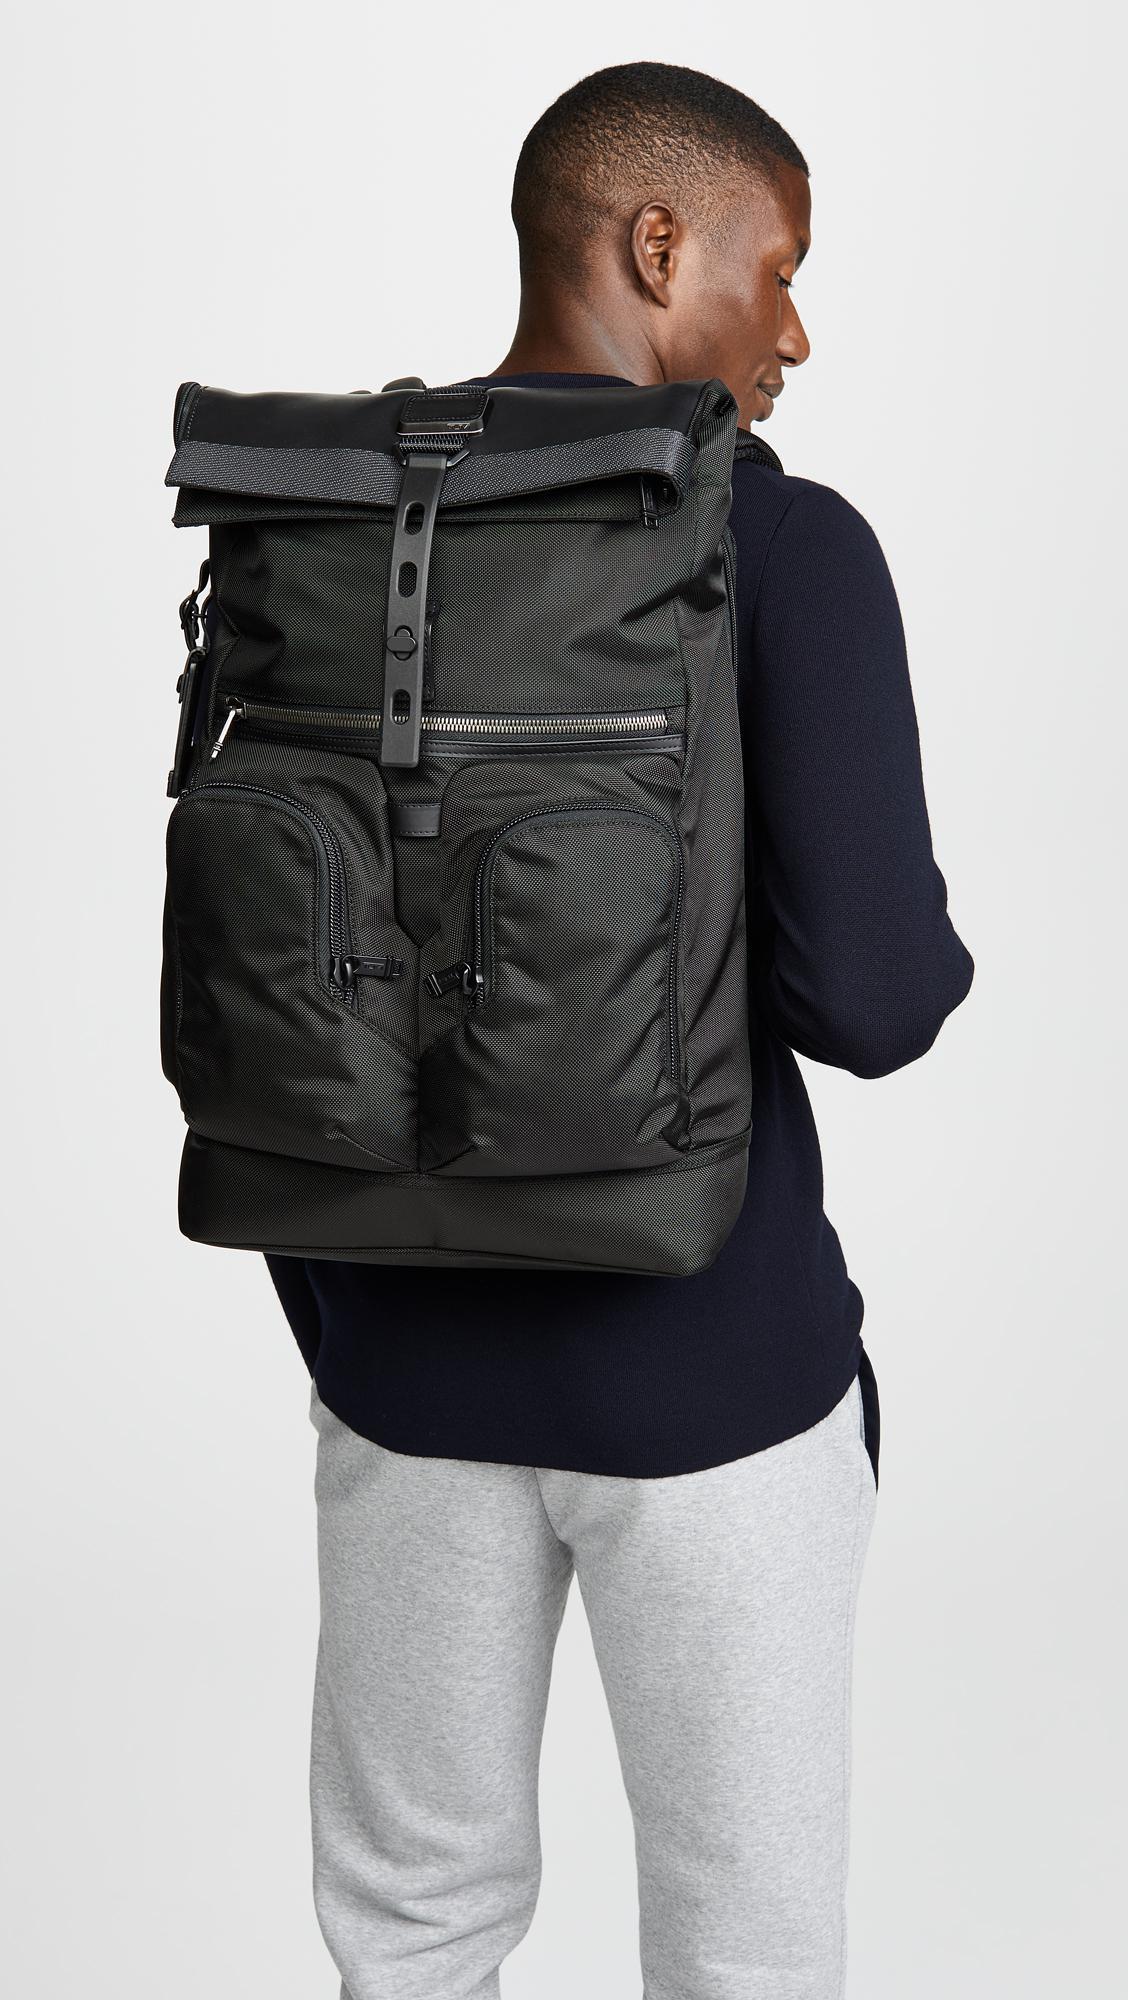 34b41733fd1 Tumi - Black Alpha Bravo London Rolltop Backpack for Men - Lyst. View  fullscreen